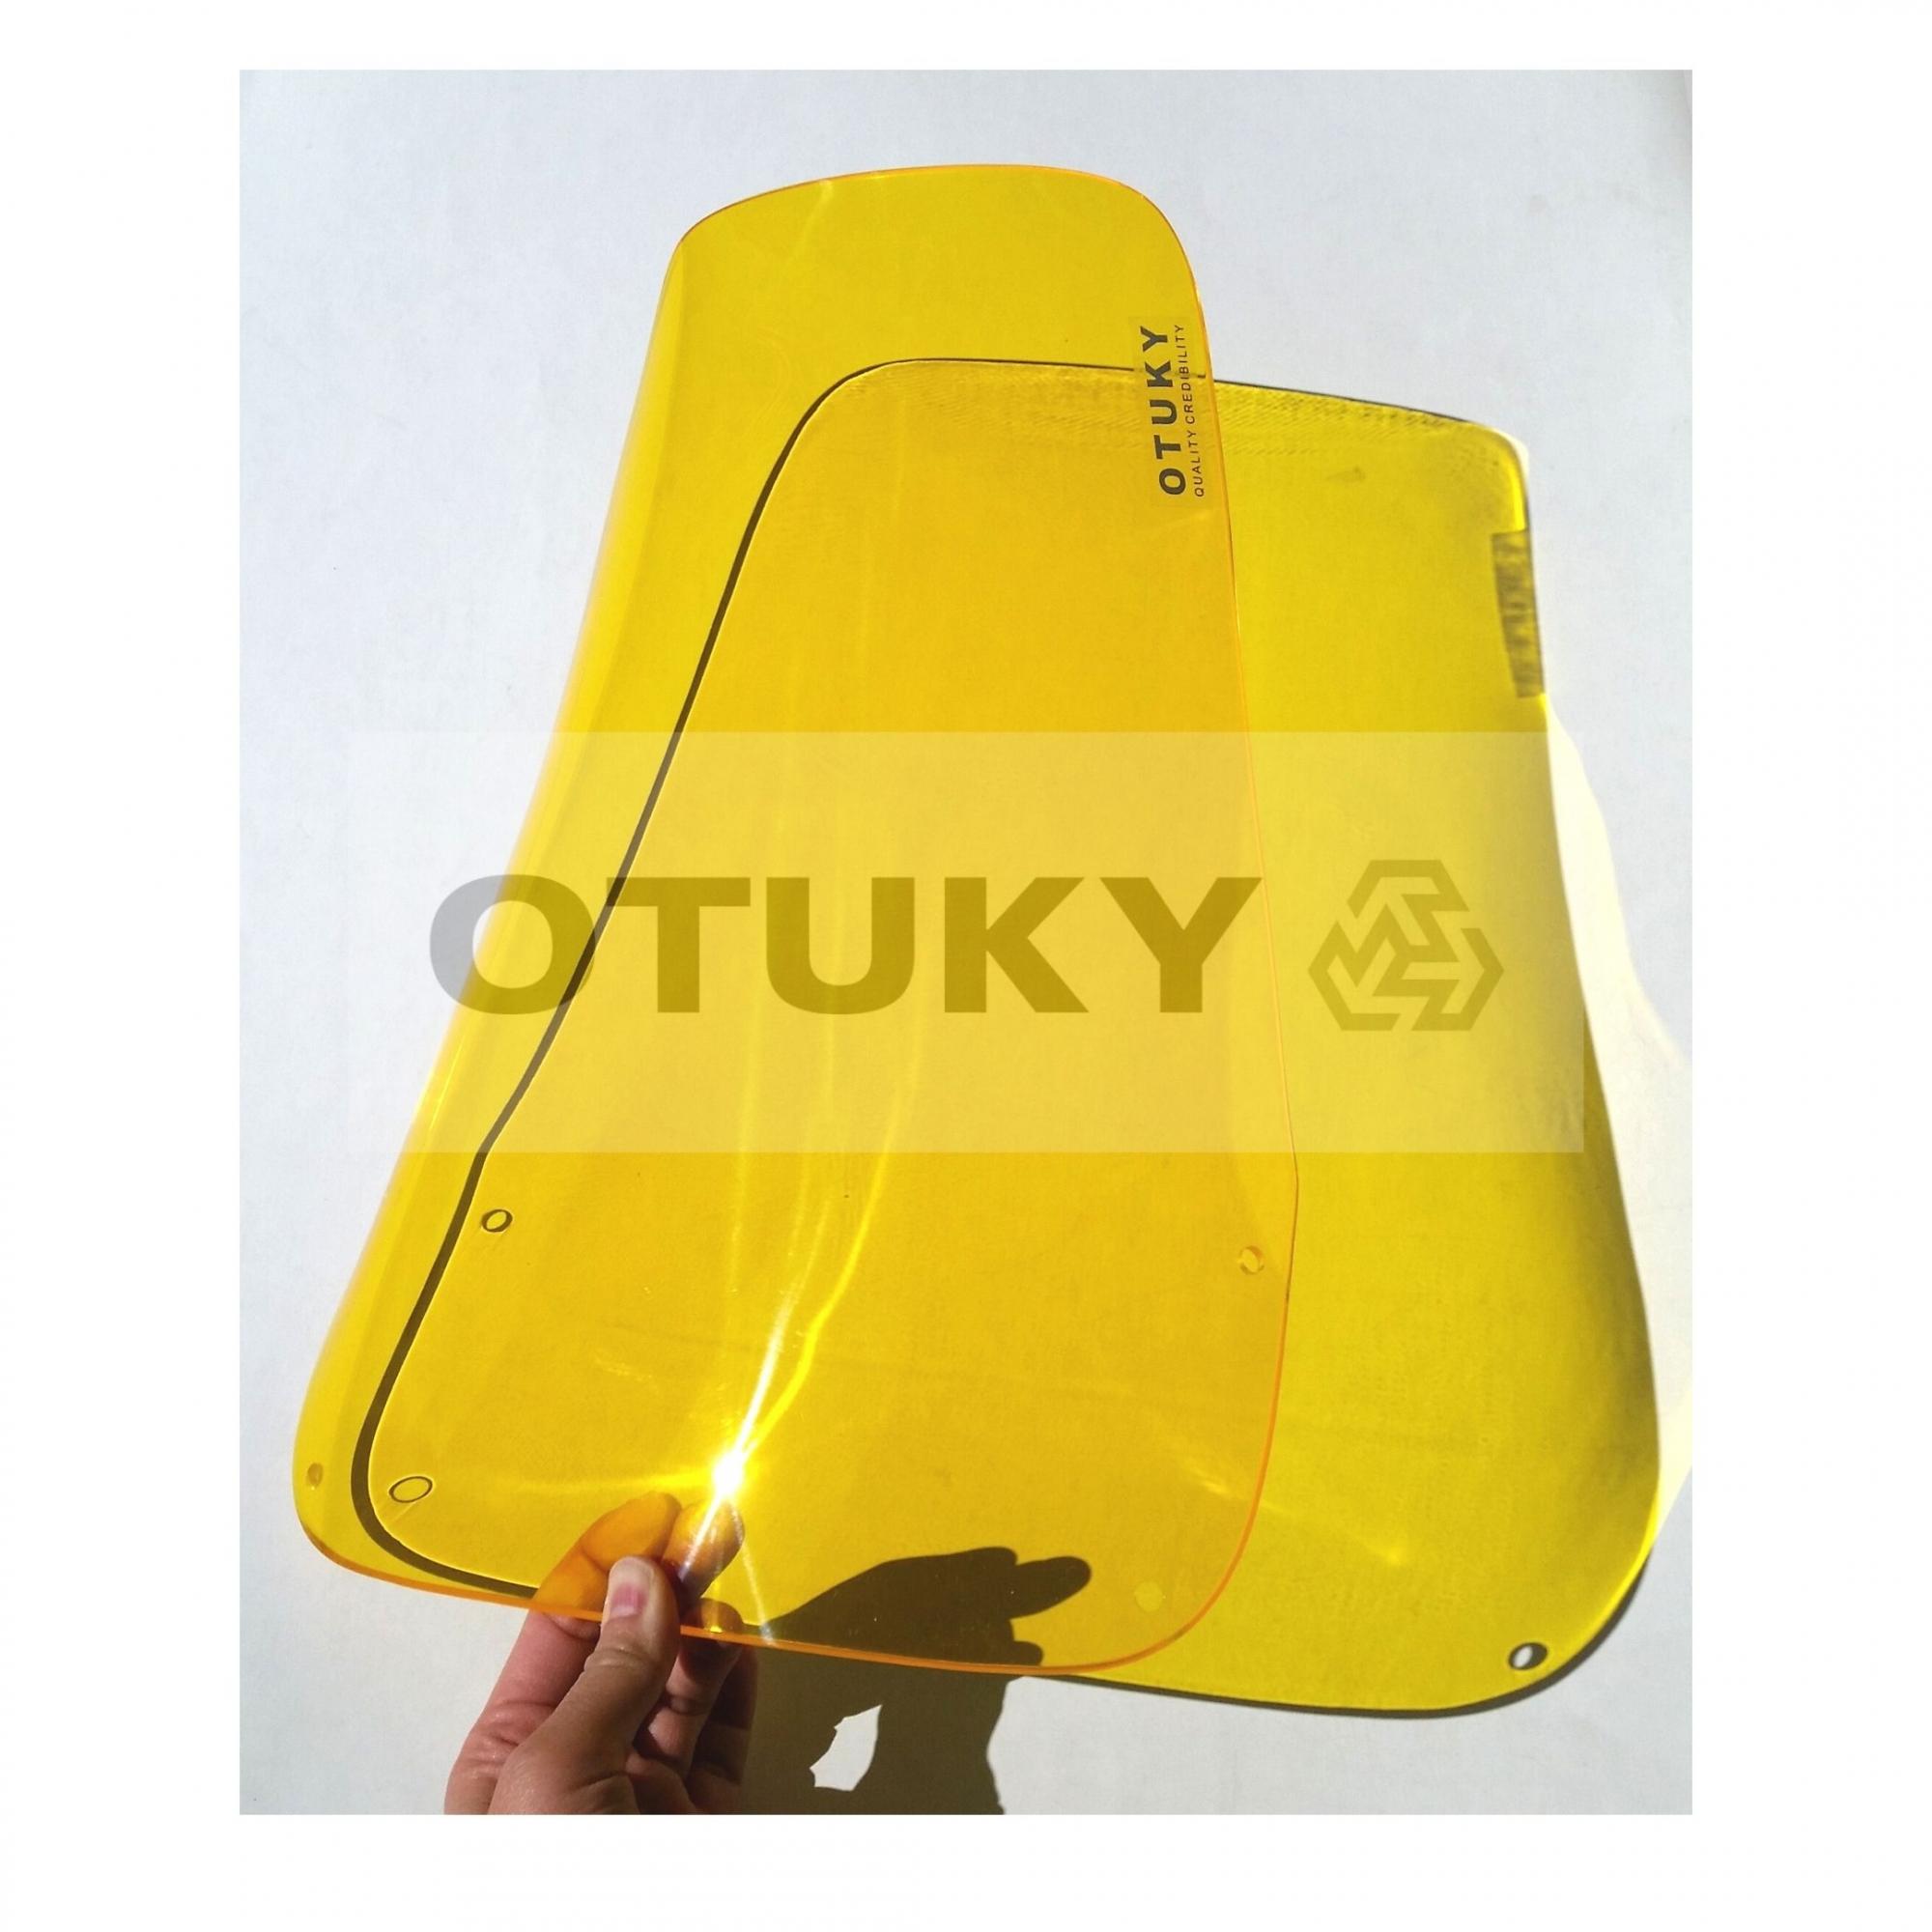 Bolha para Moto Ténéré 600 2 Farois Otuky Alongada +10cm Amarelo